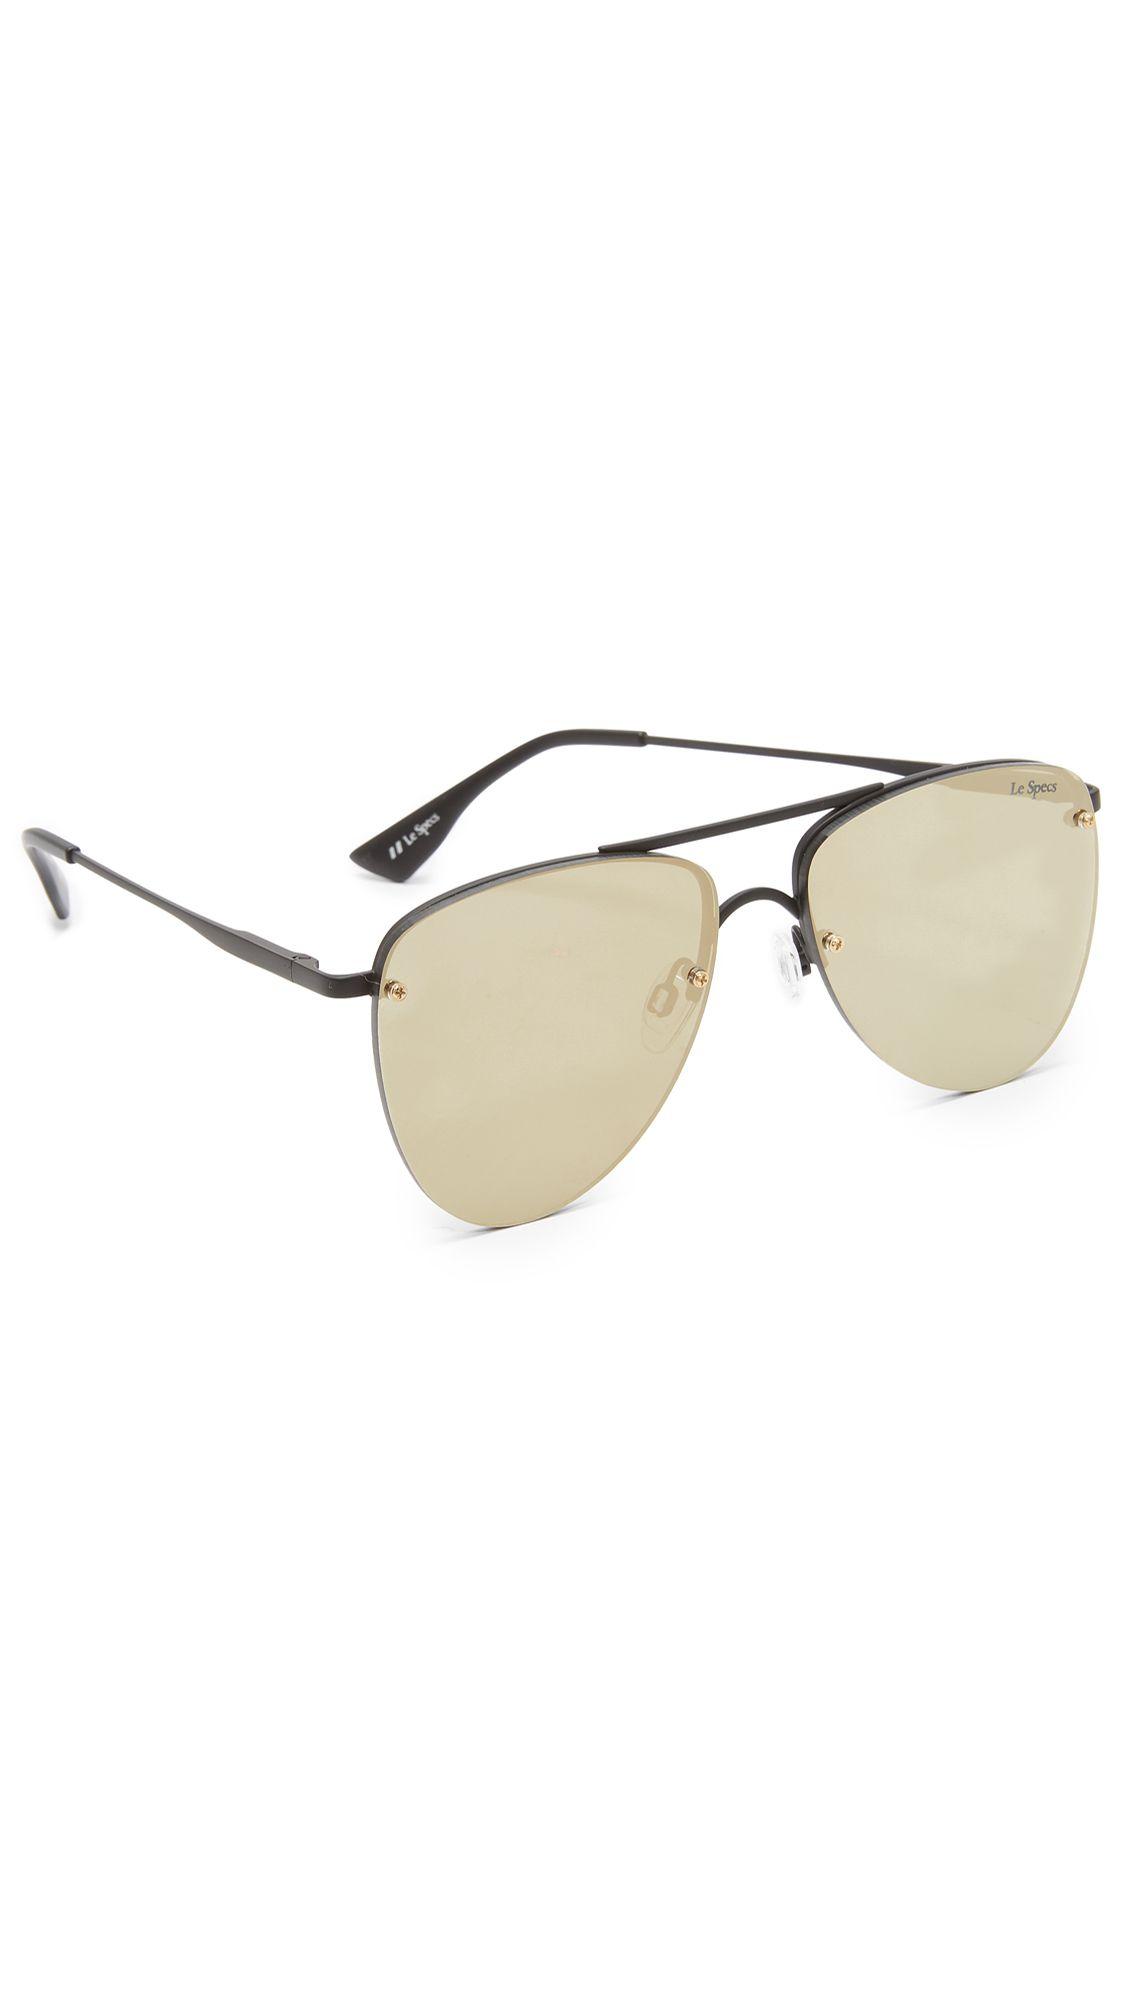 51710327e9 LE SPECS The Prince Sunglasses.  lespecs  sunglasses